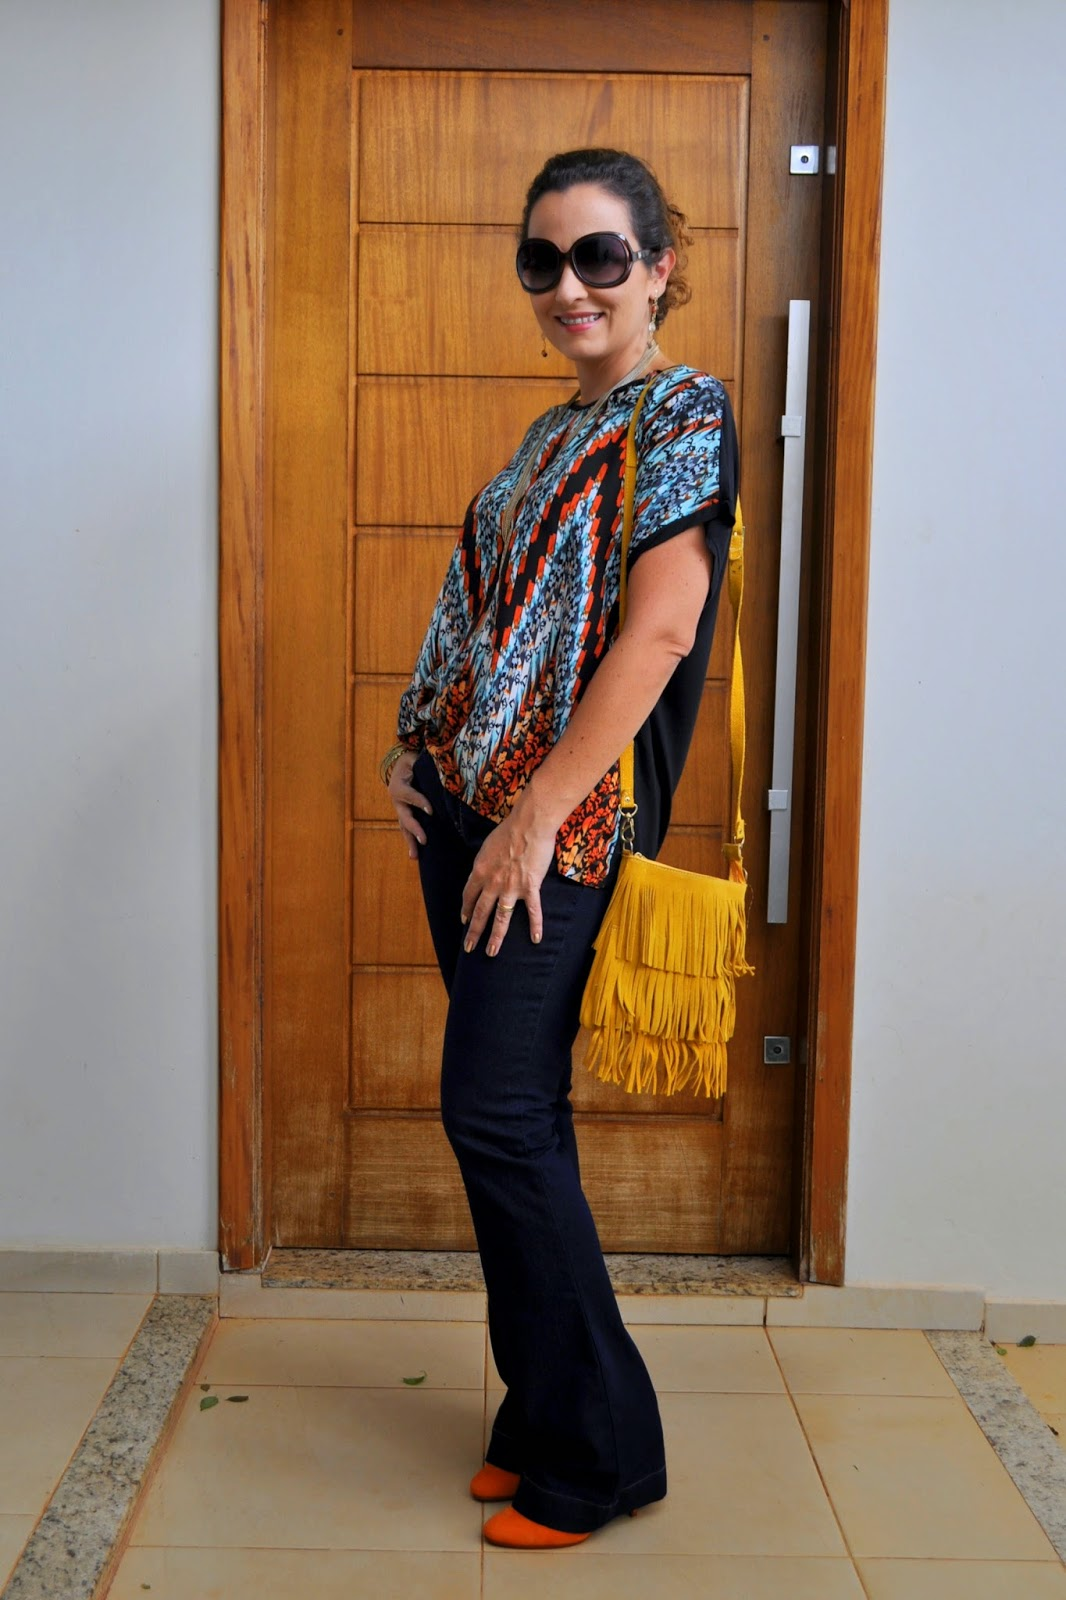 estampa étnica e jeans flare